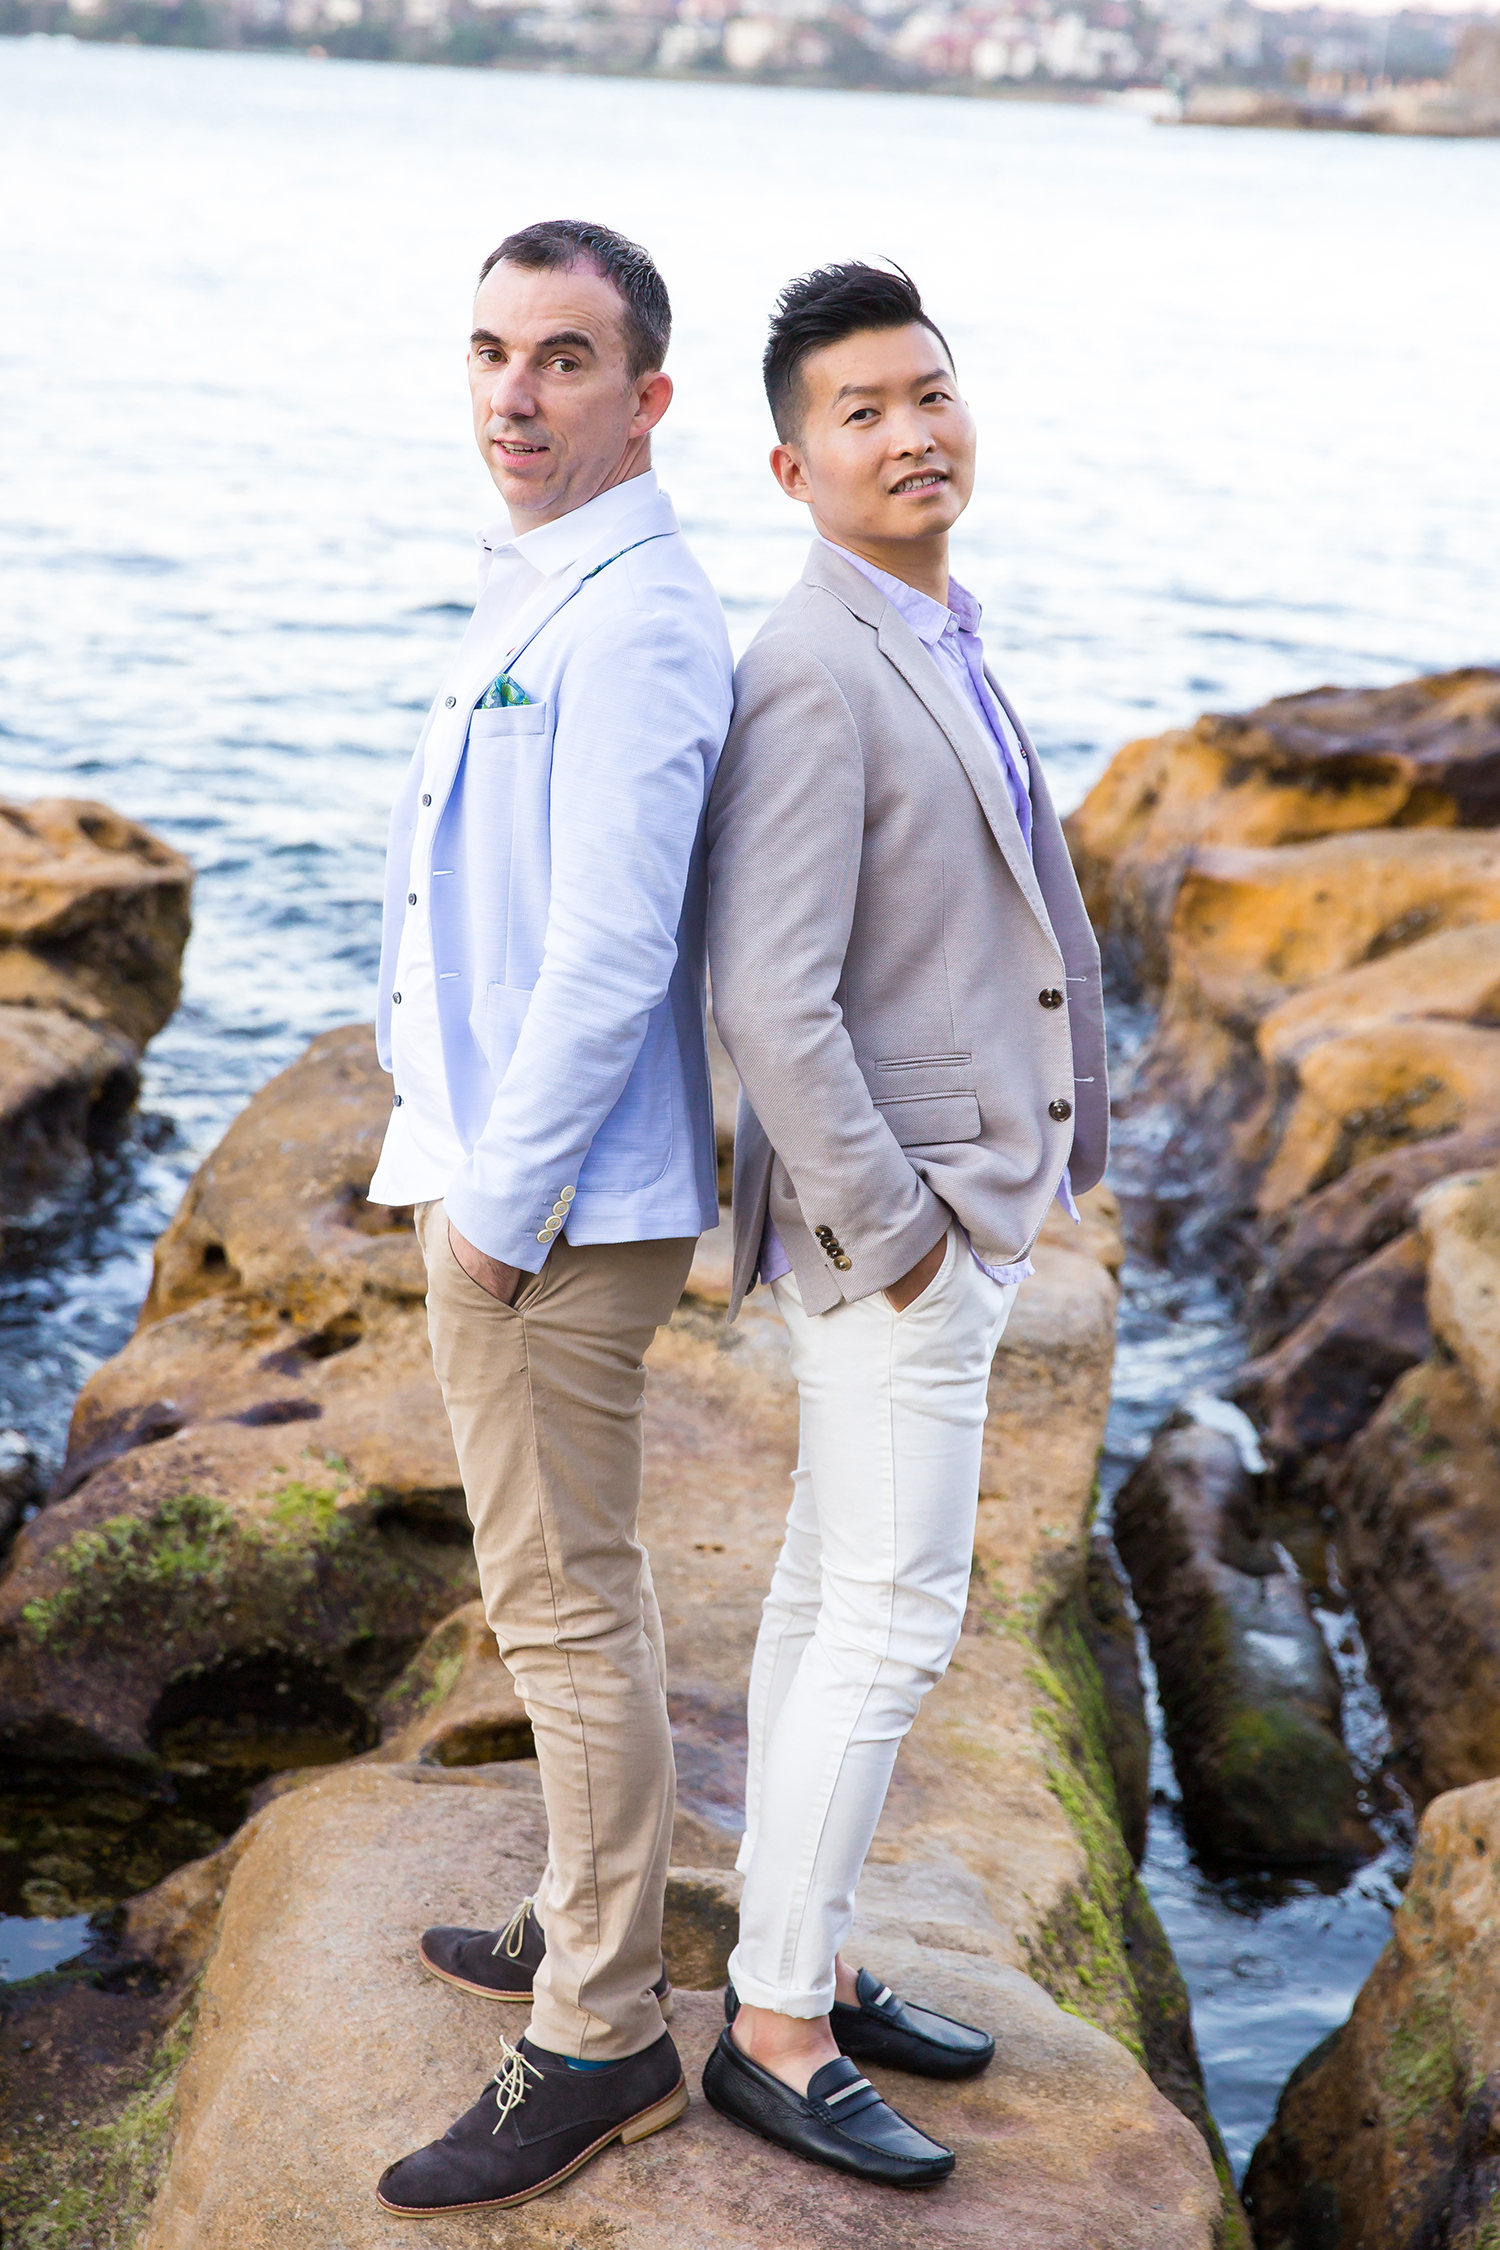 Sydney Gay Wedding Photographer - Jennifer Lam Photography (59).jpg